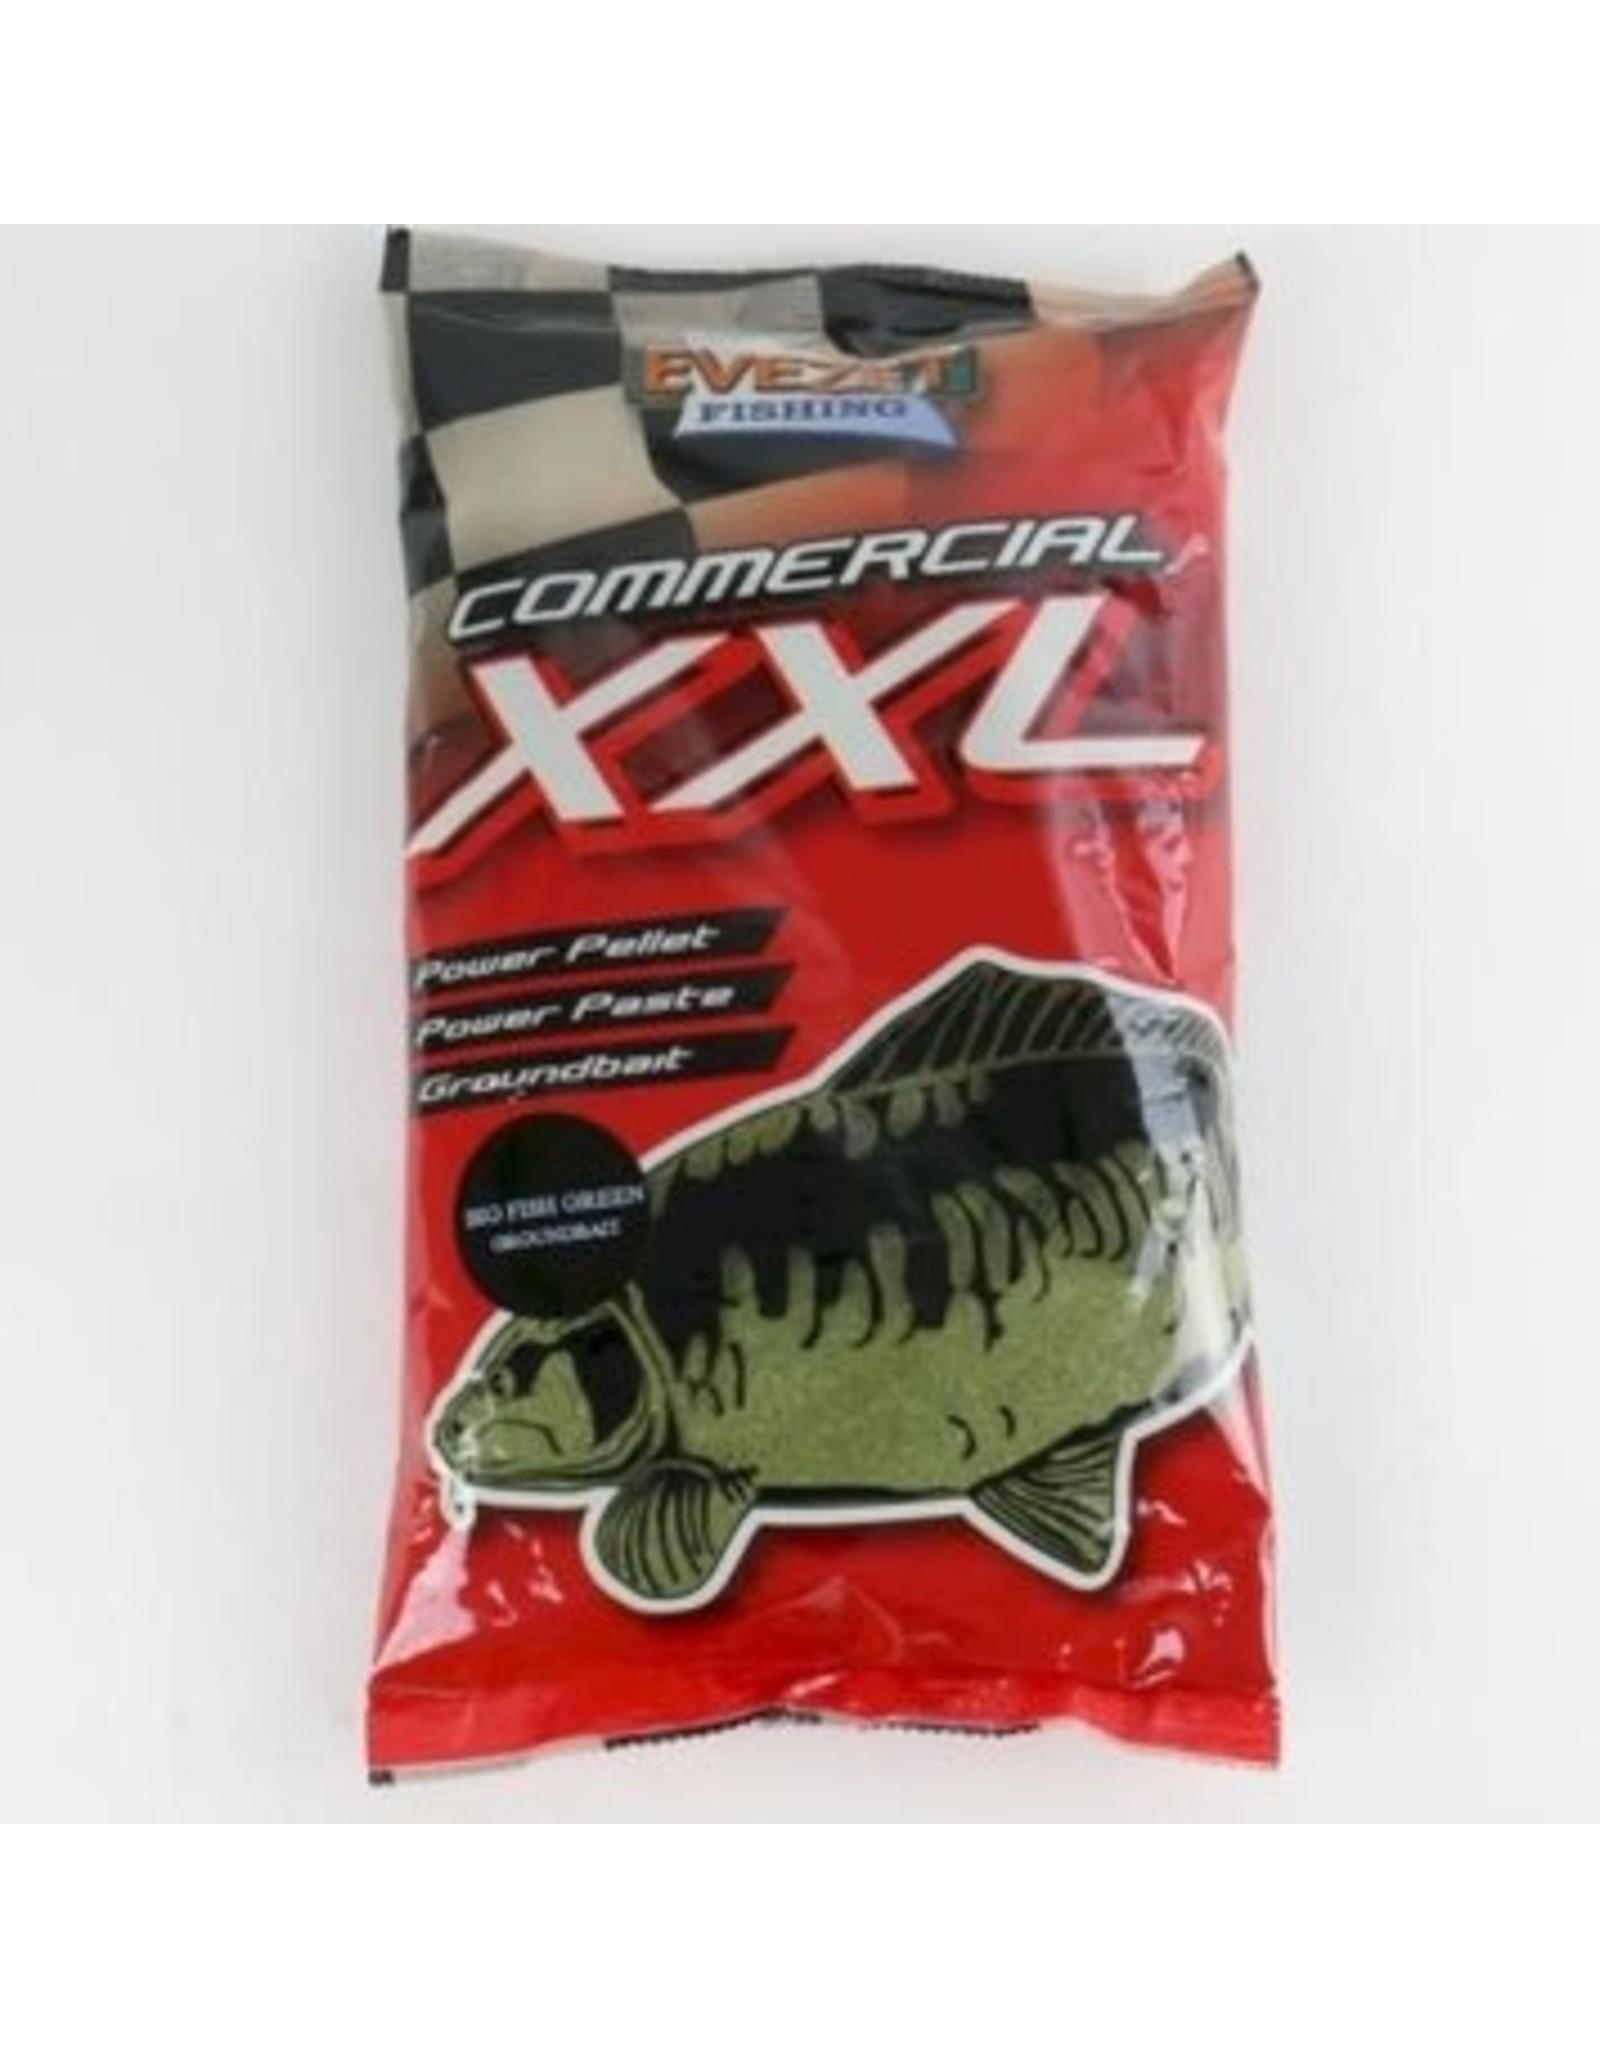 evezet xxl Comercial Groundbait big fish green